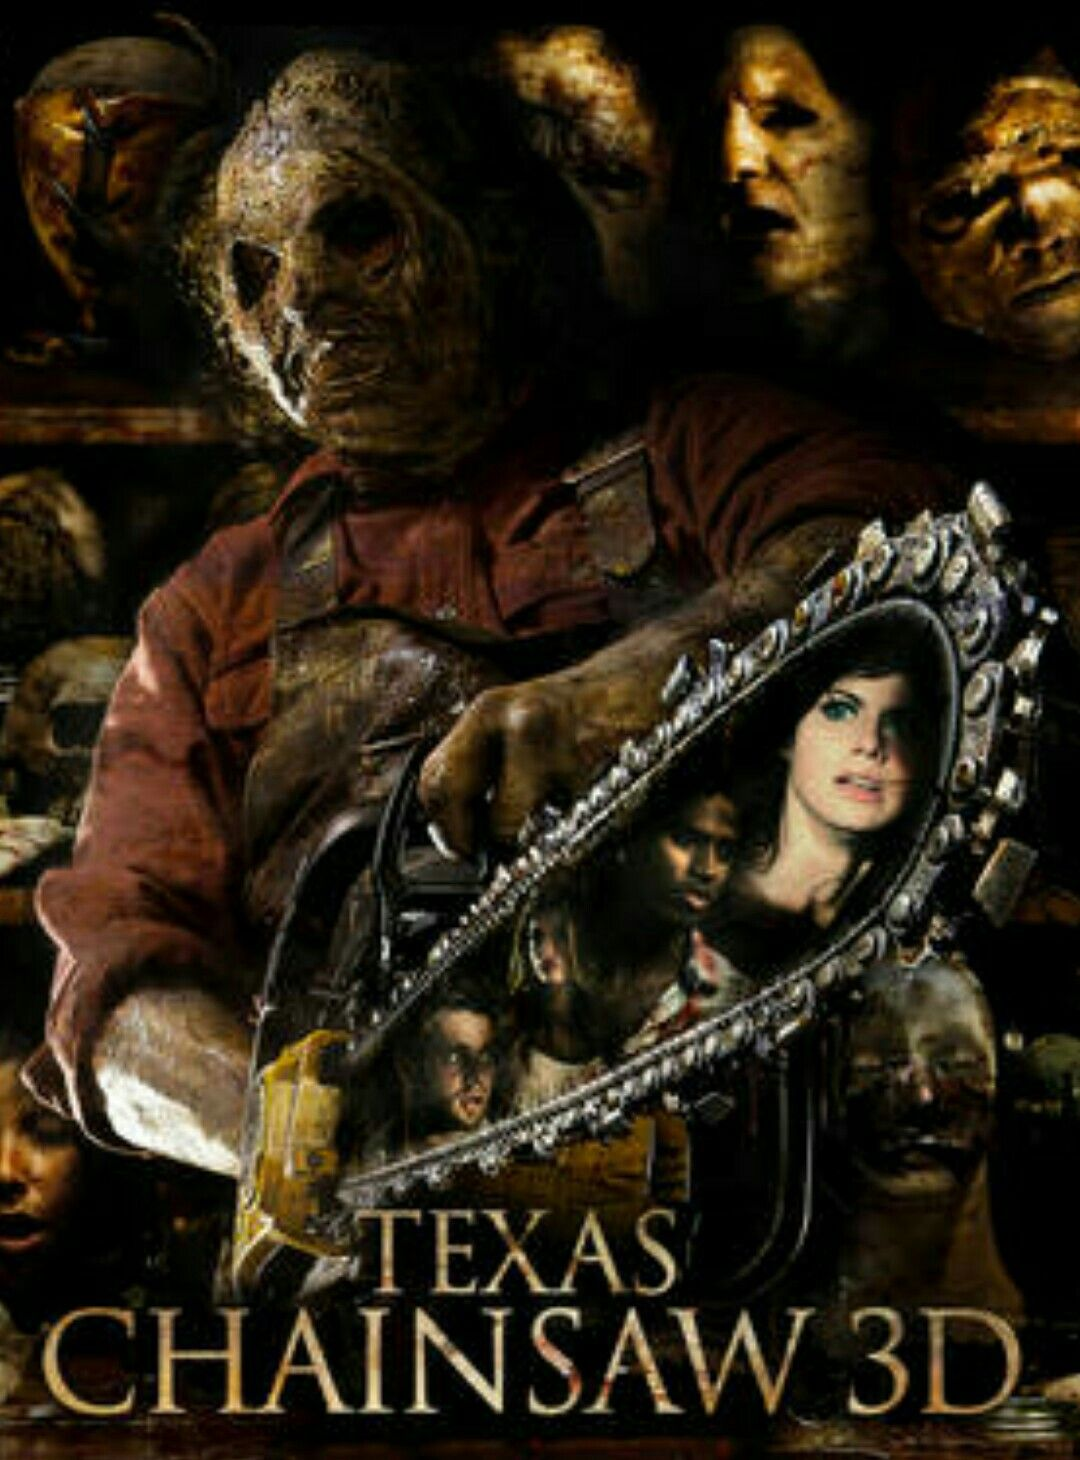 Texas Chainsaw 3D Horror Movie Slasher